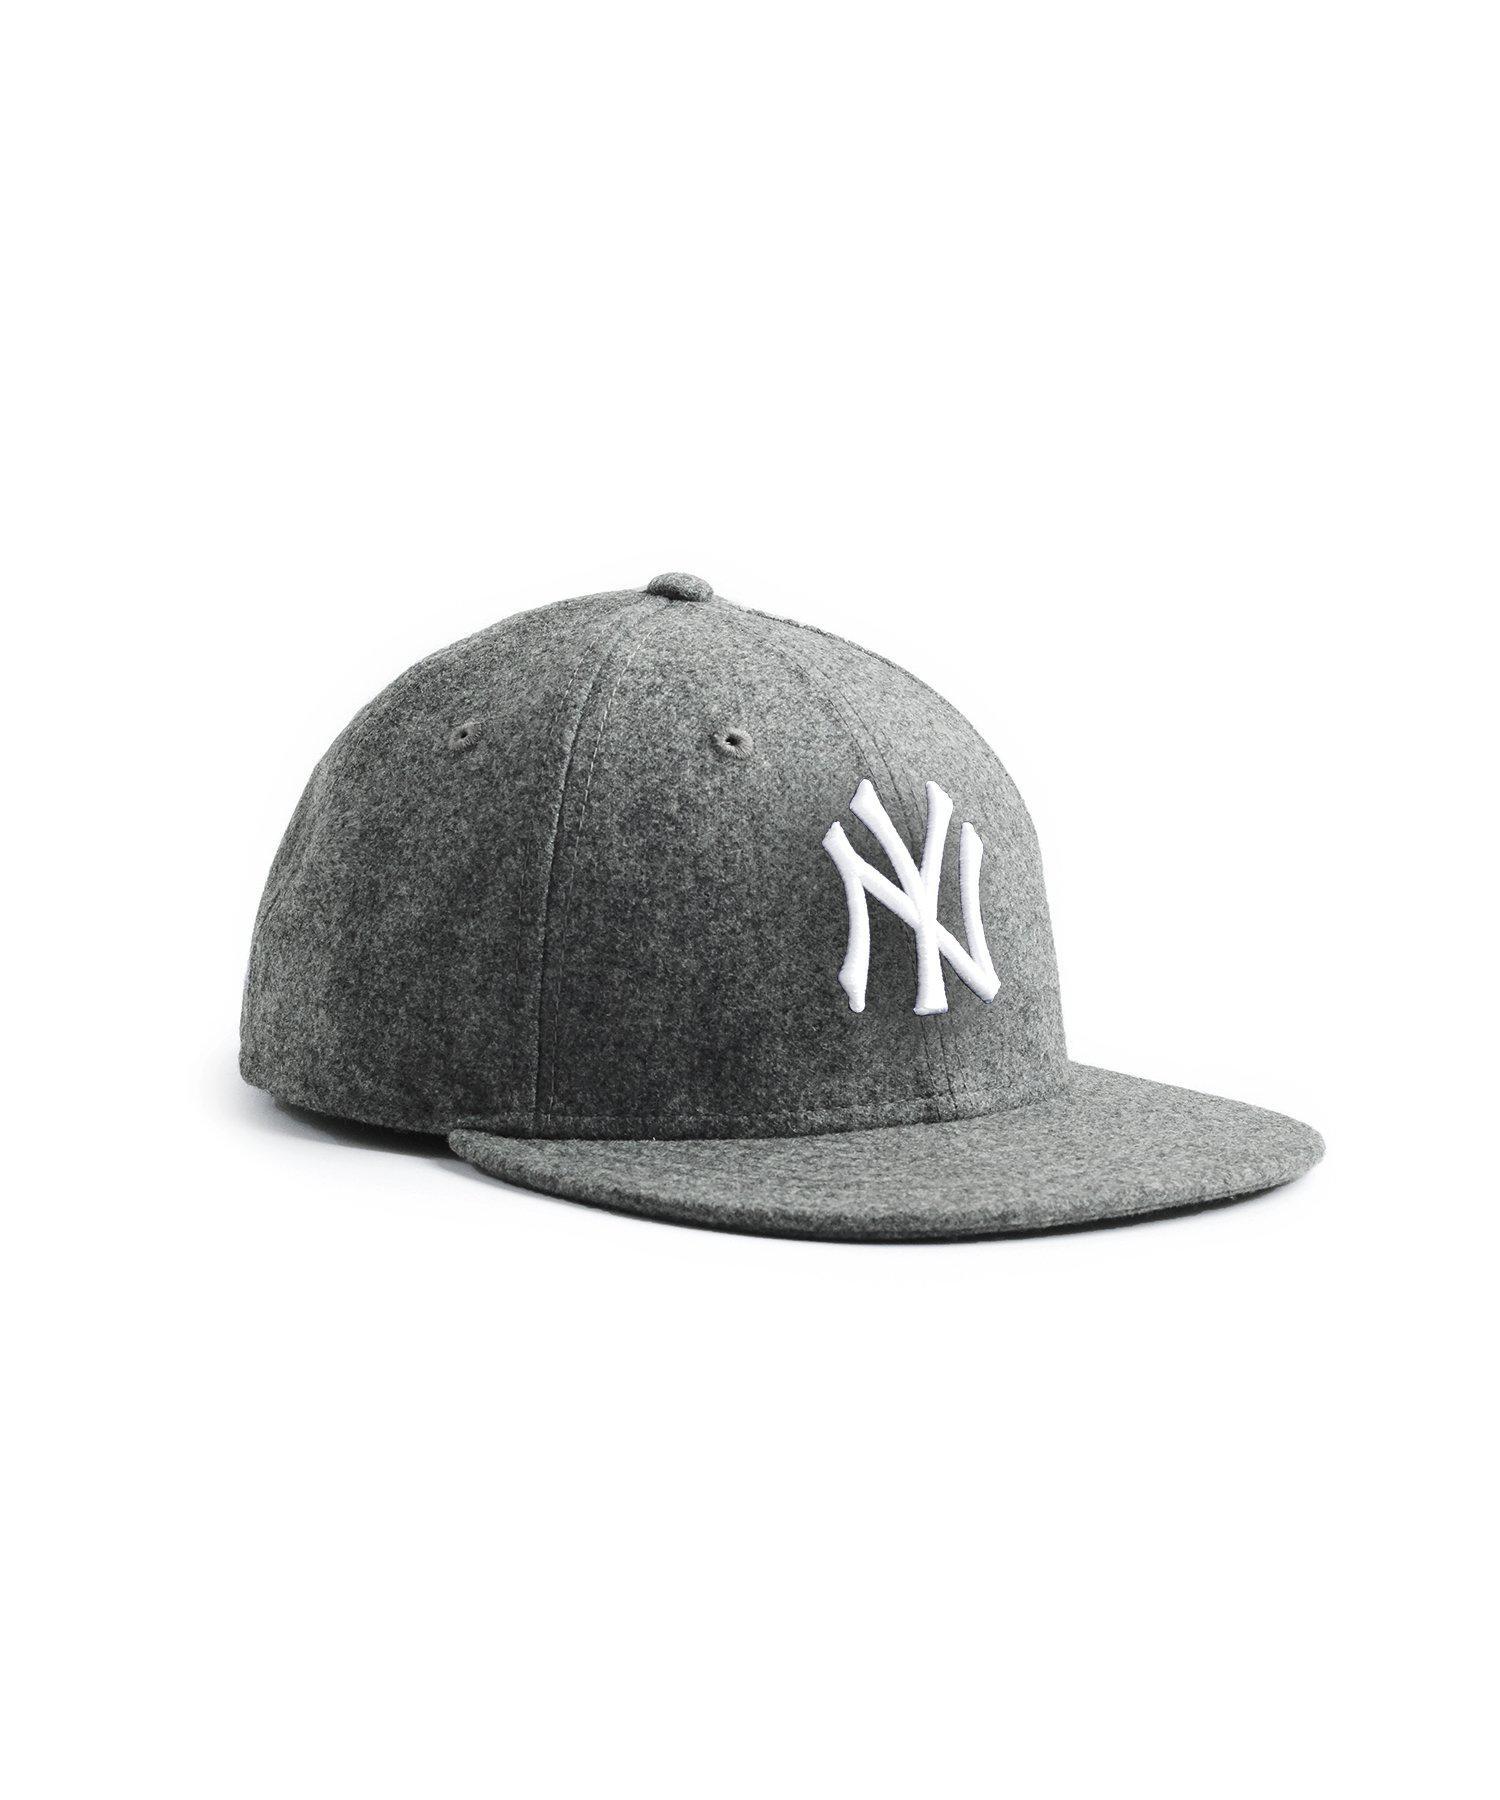 ff52a8d1d29 Lyst - NEW ERA HATS Exclusive Ny Yankees Hat In Italian Barberis ...